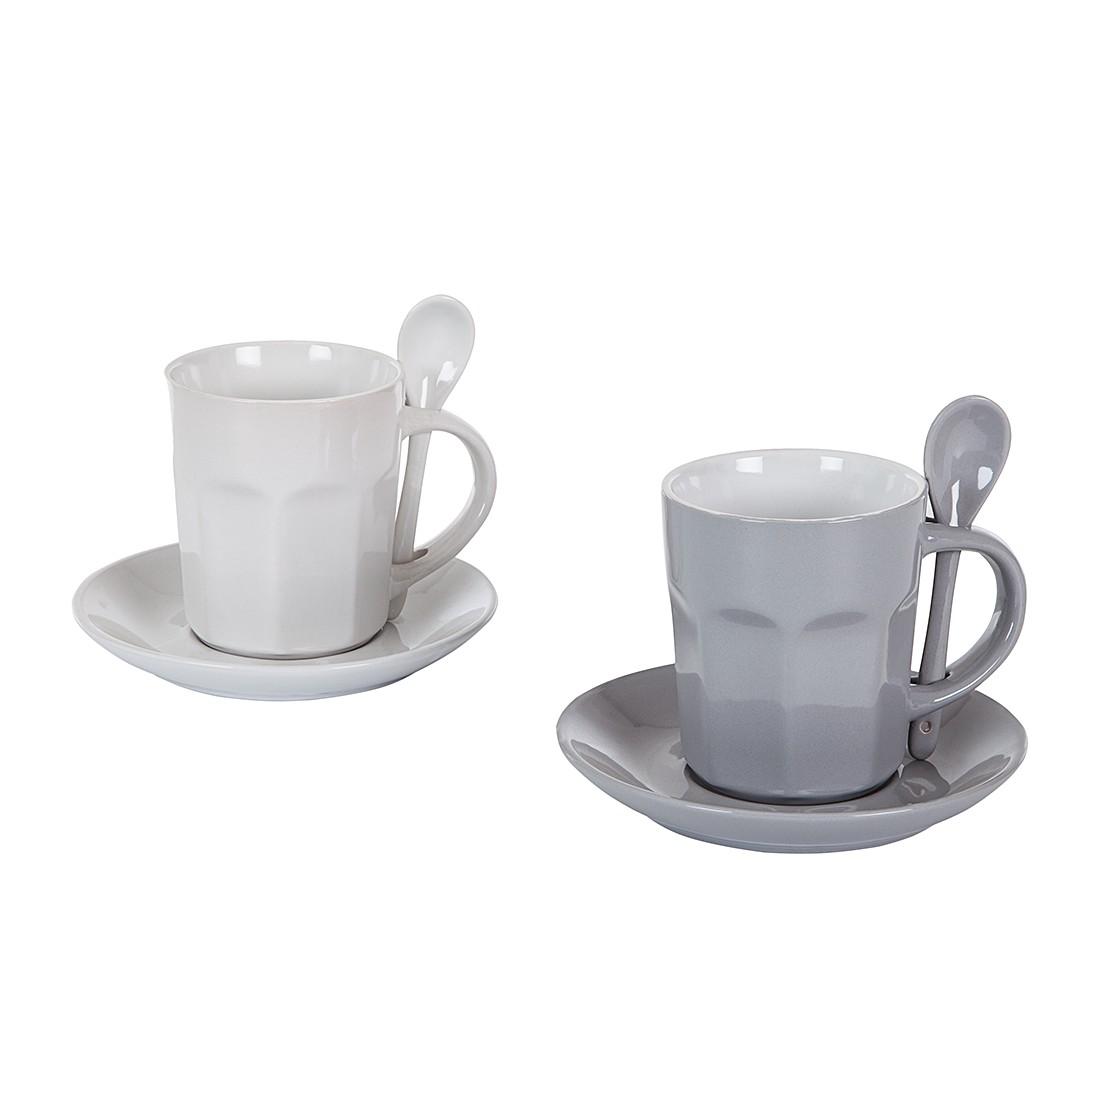 Kaffee-Set Intermezzo (2-teilig) – weiß/grau, Contento günstig